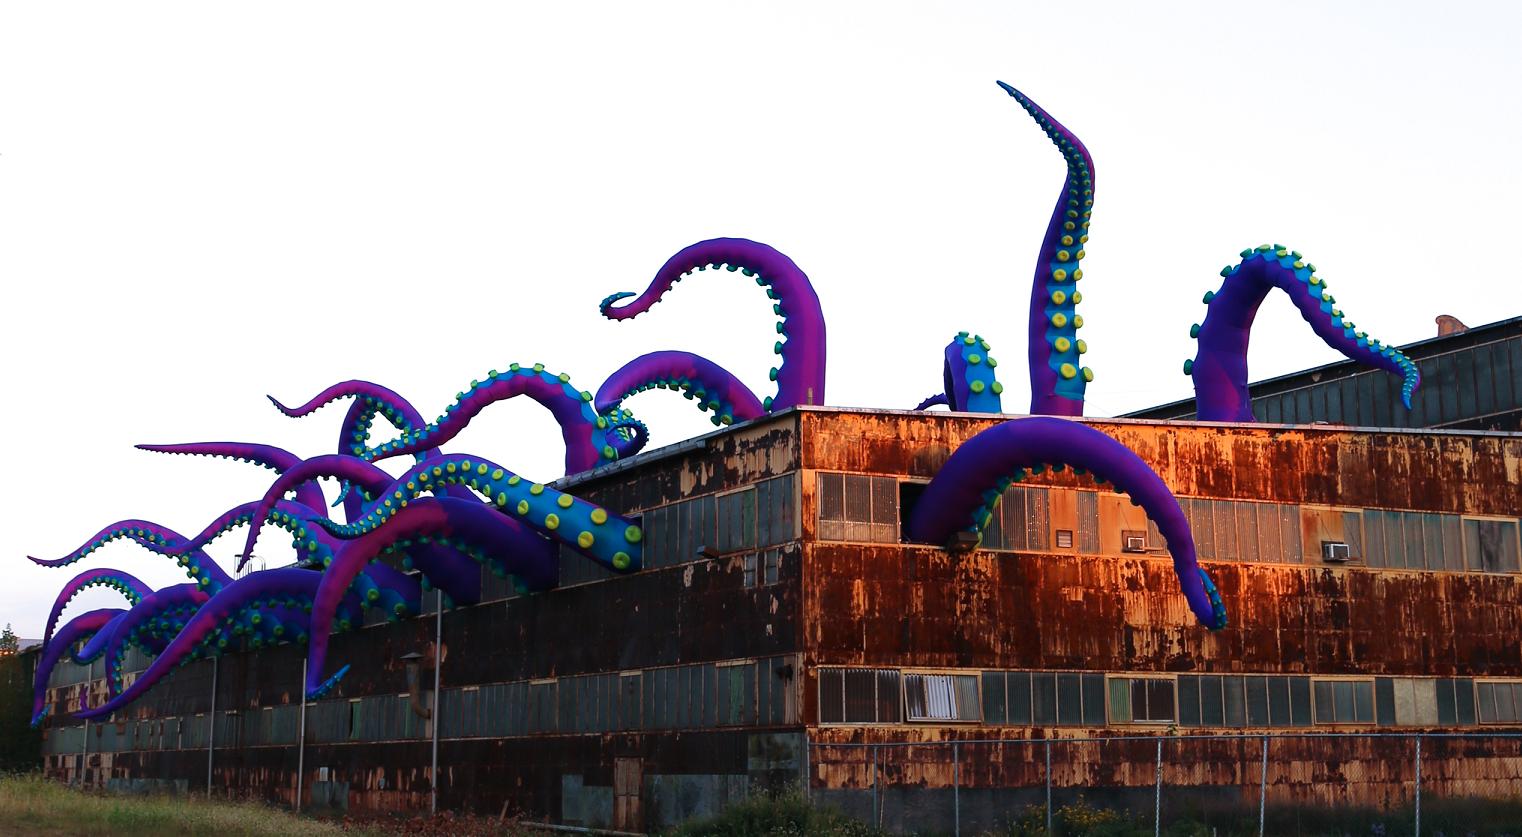 Giant Sea Monsters Art